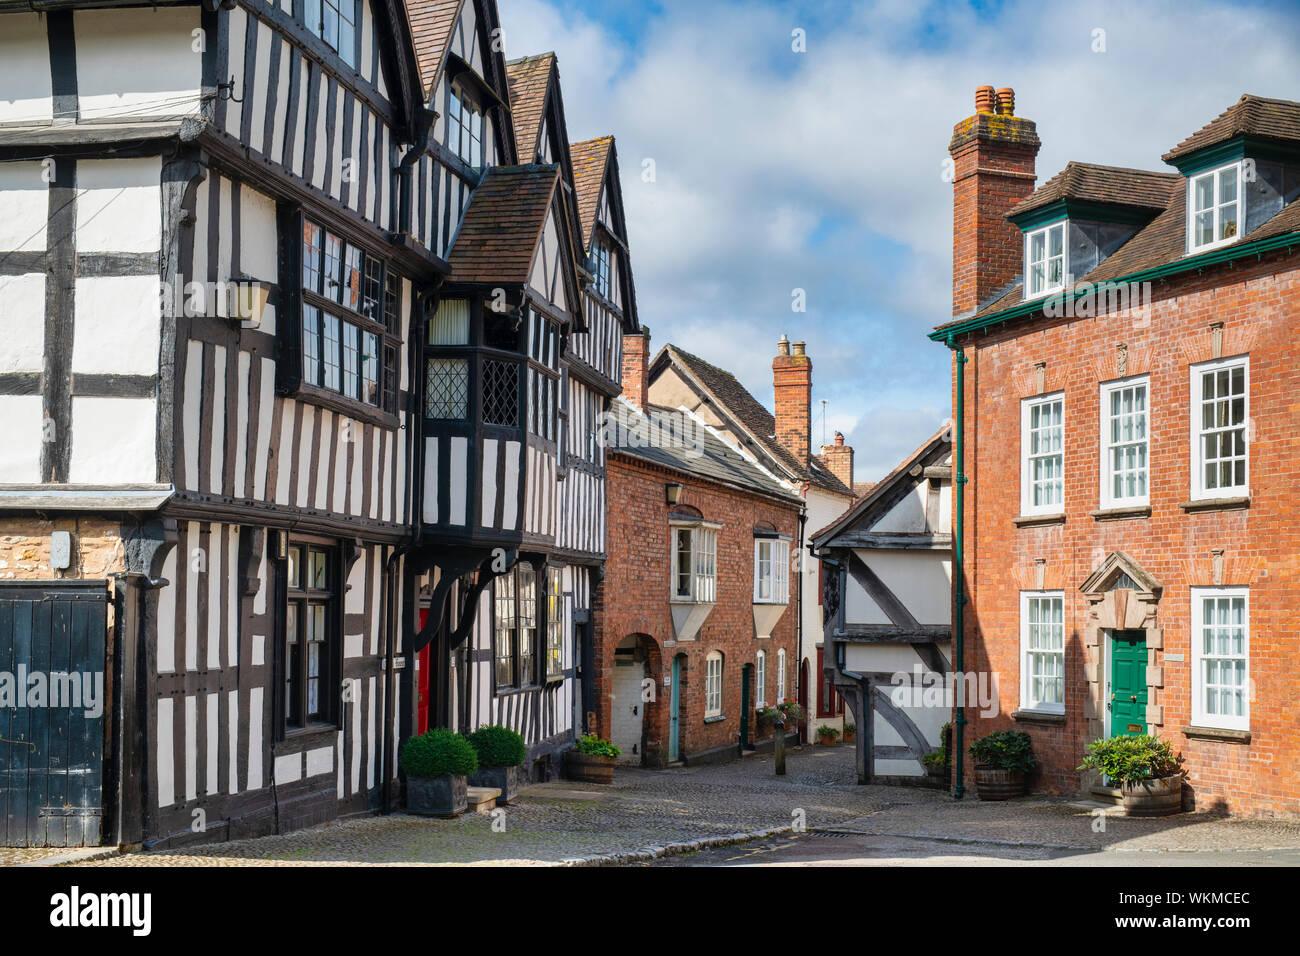 Timber framed period buildings along church lane, Ledbury Herefordshire. England Stock Photo